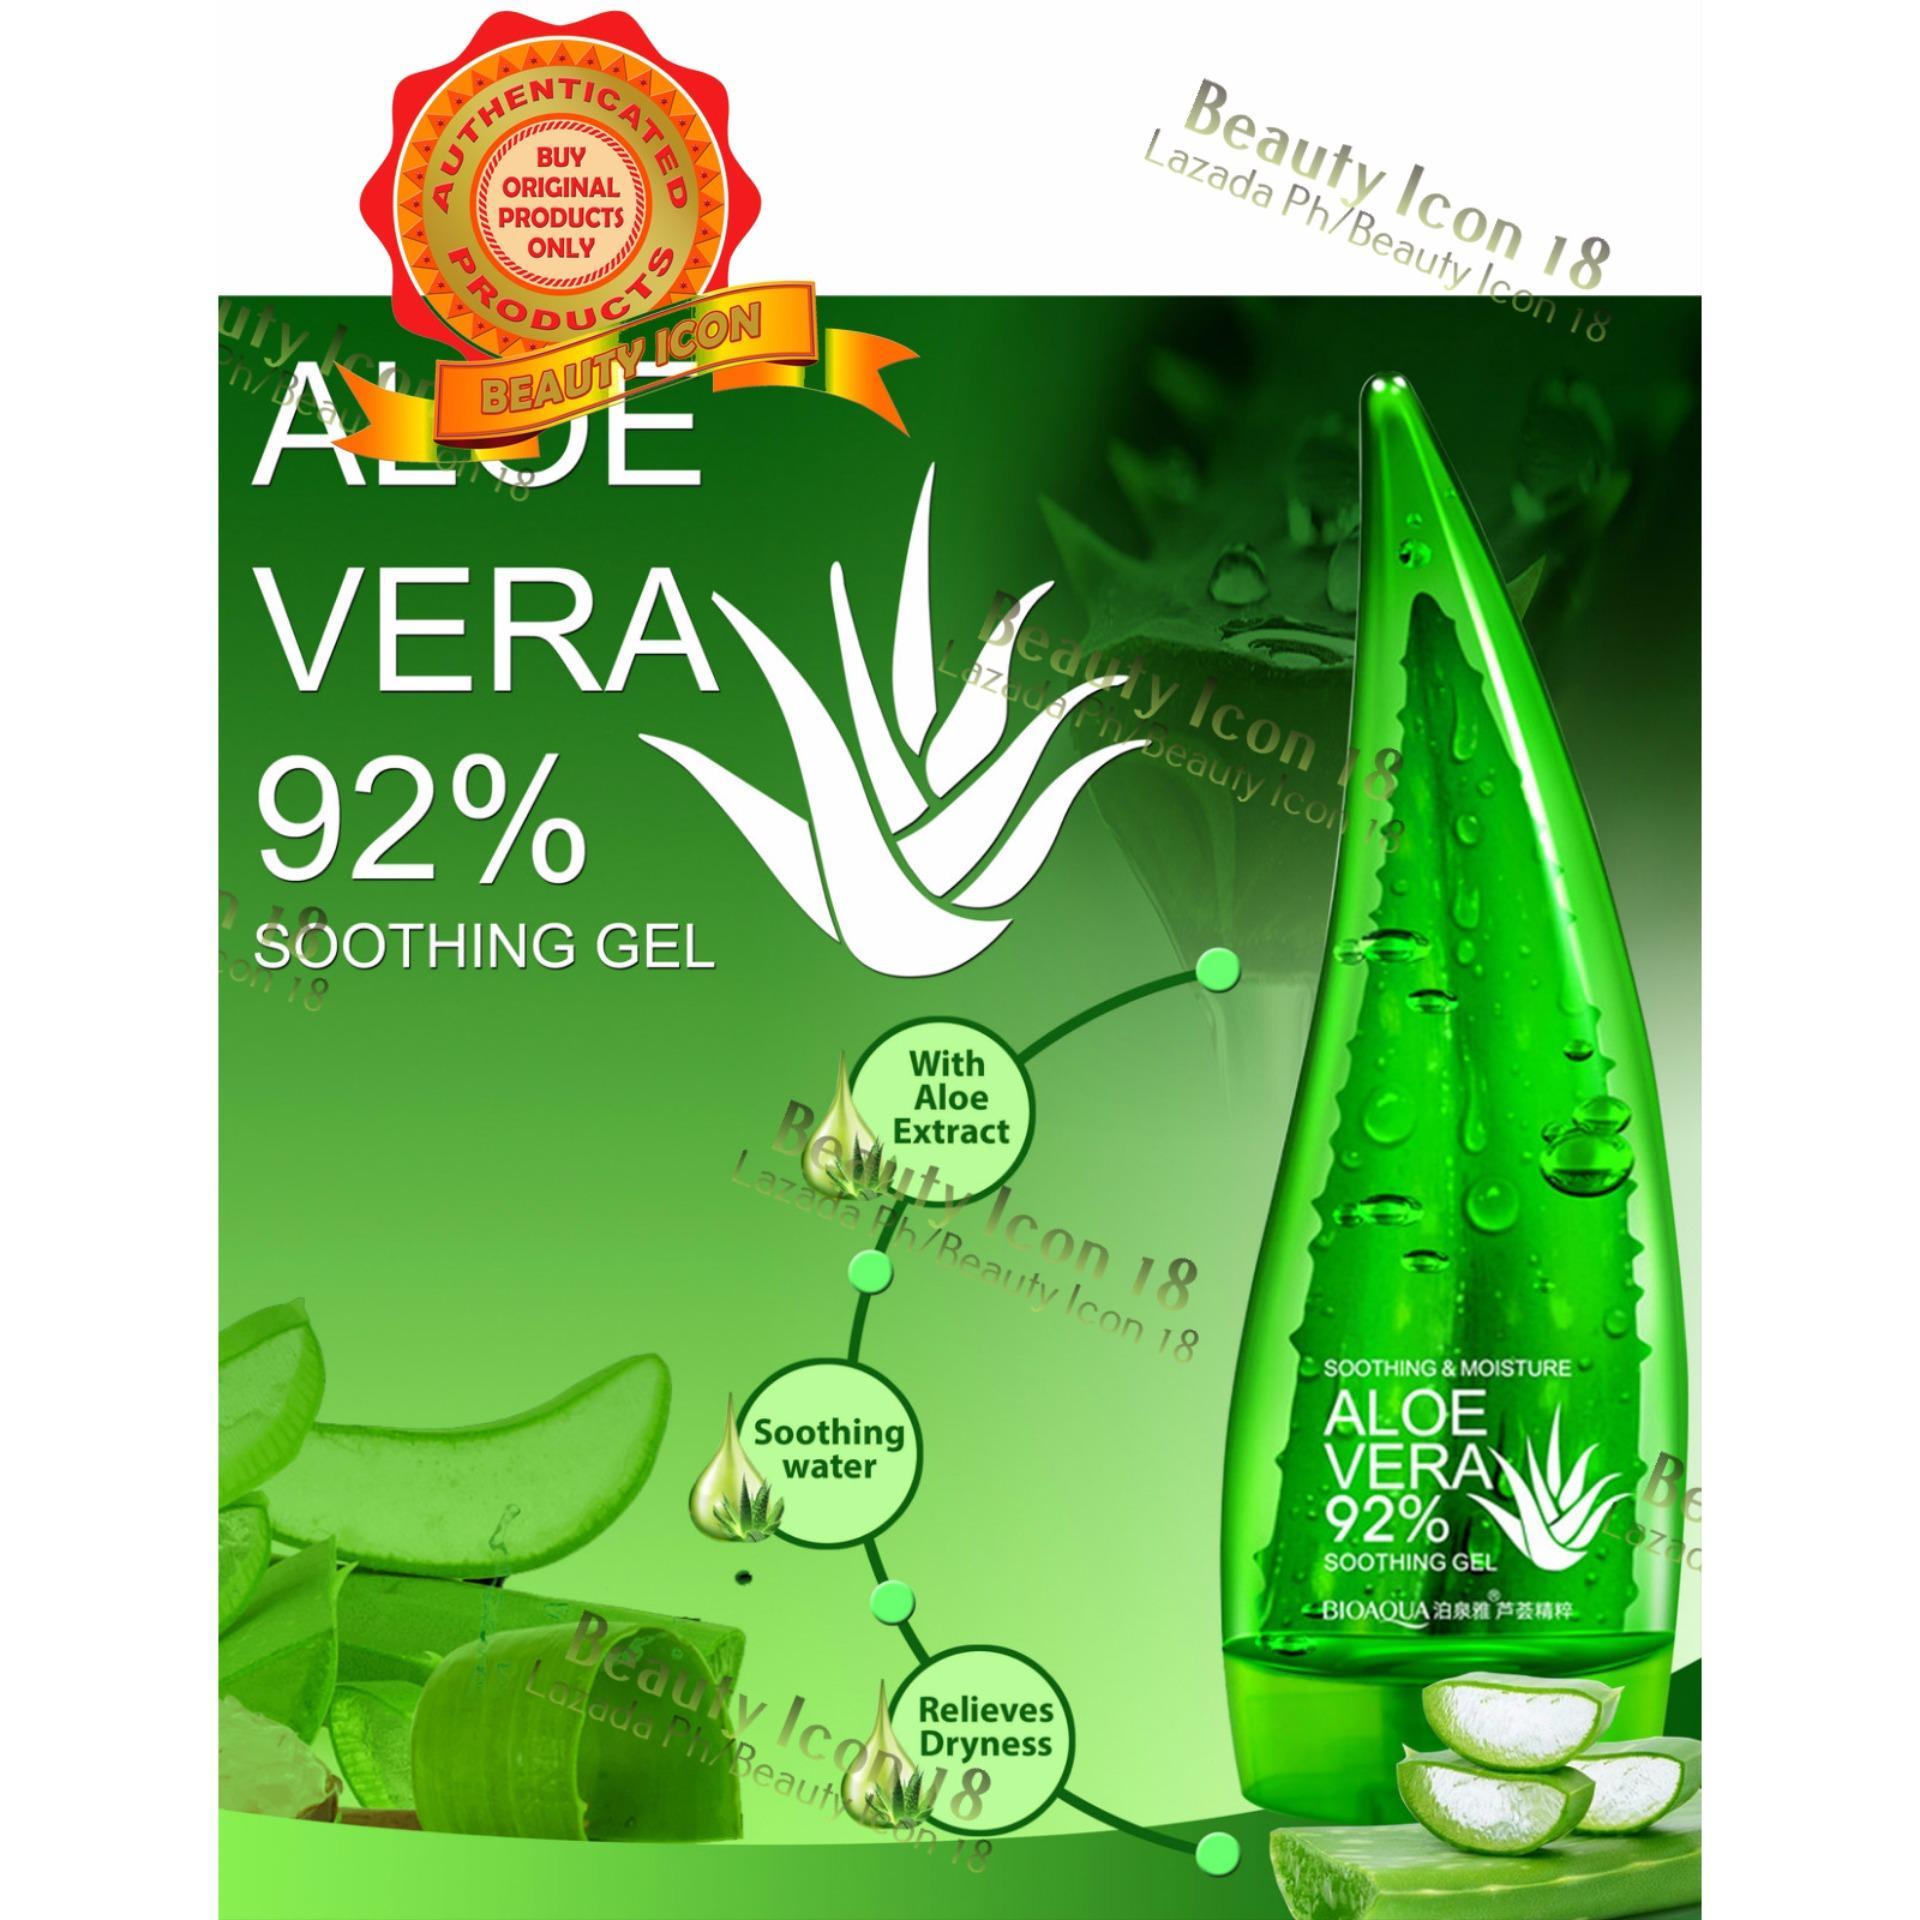 Philippines Bioaqua Aloe Vera Moisturizing Repair Gel 160ml New Price Aloevera